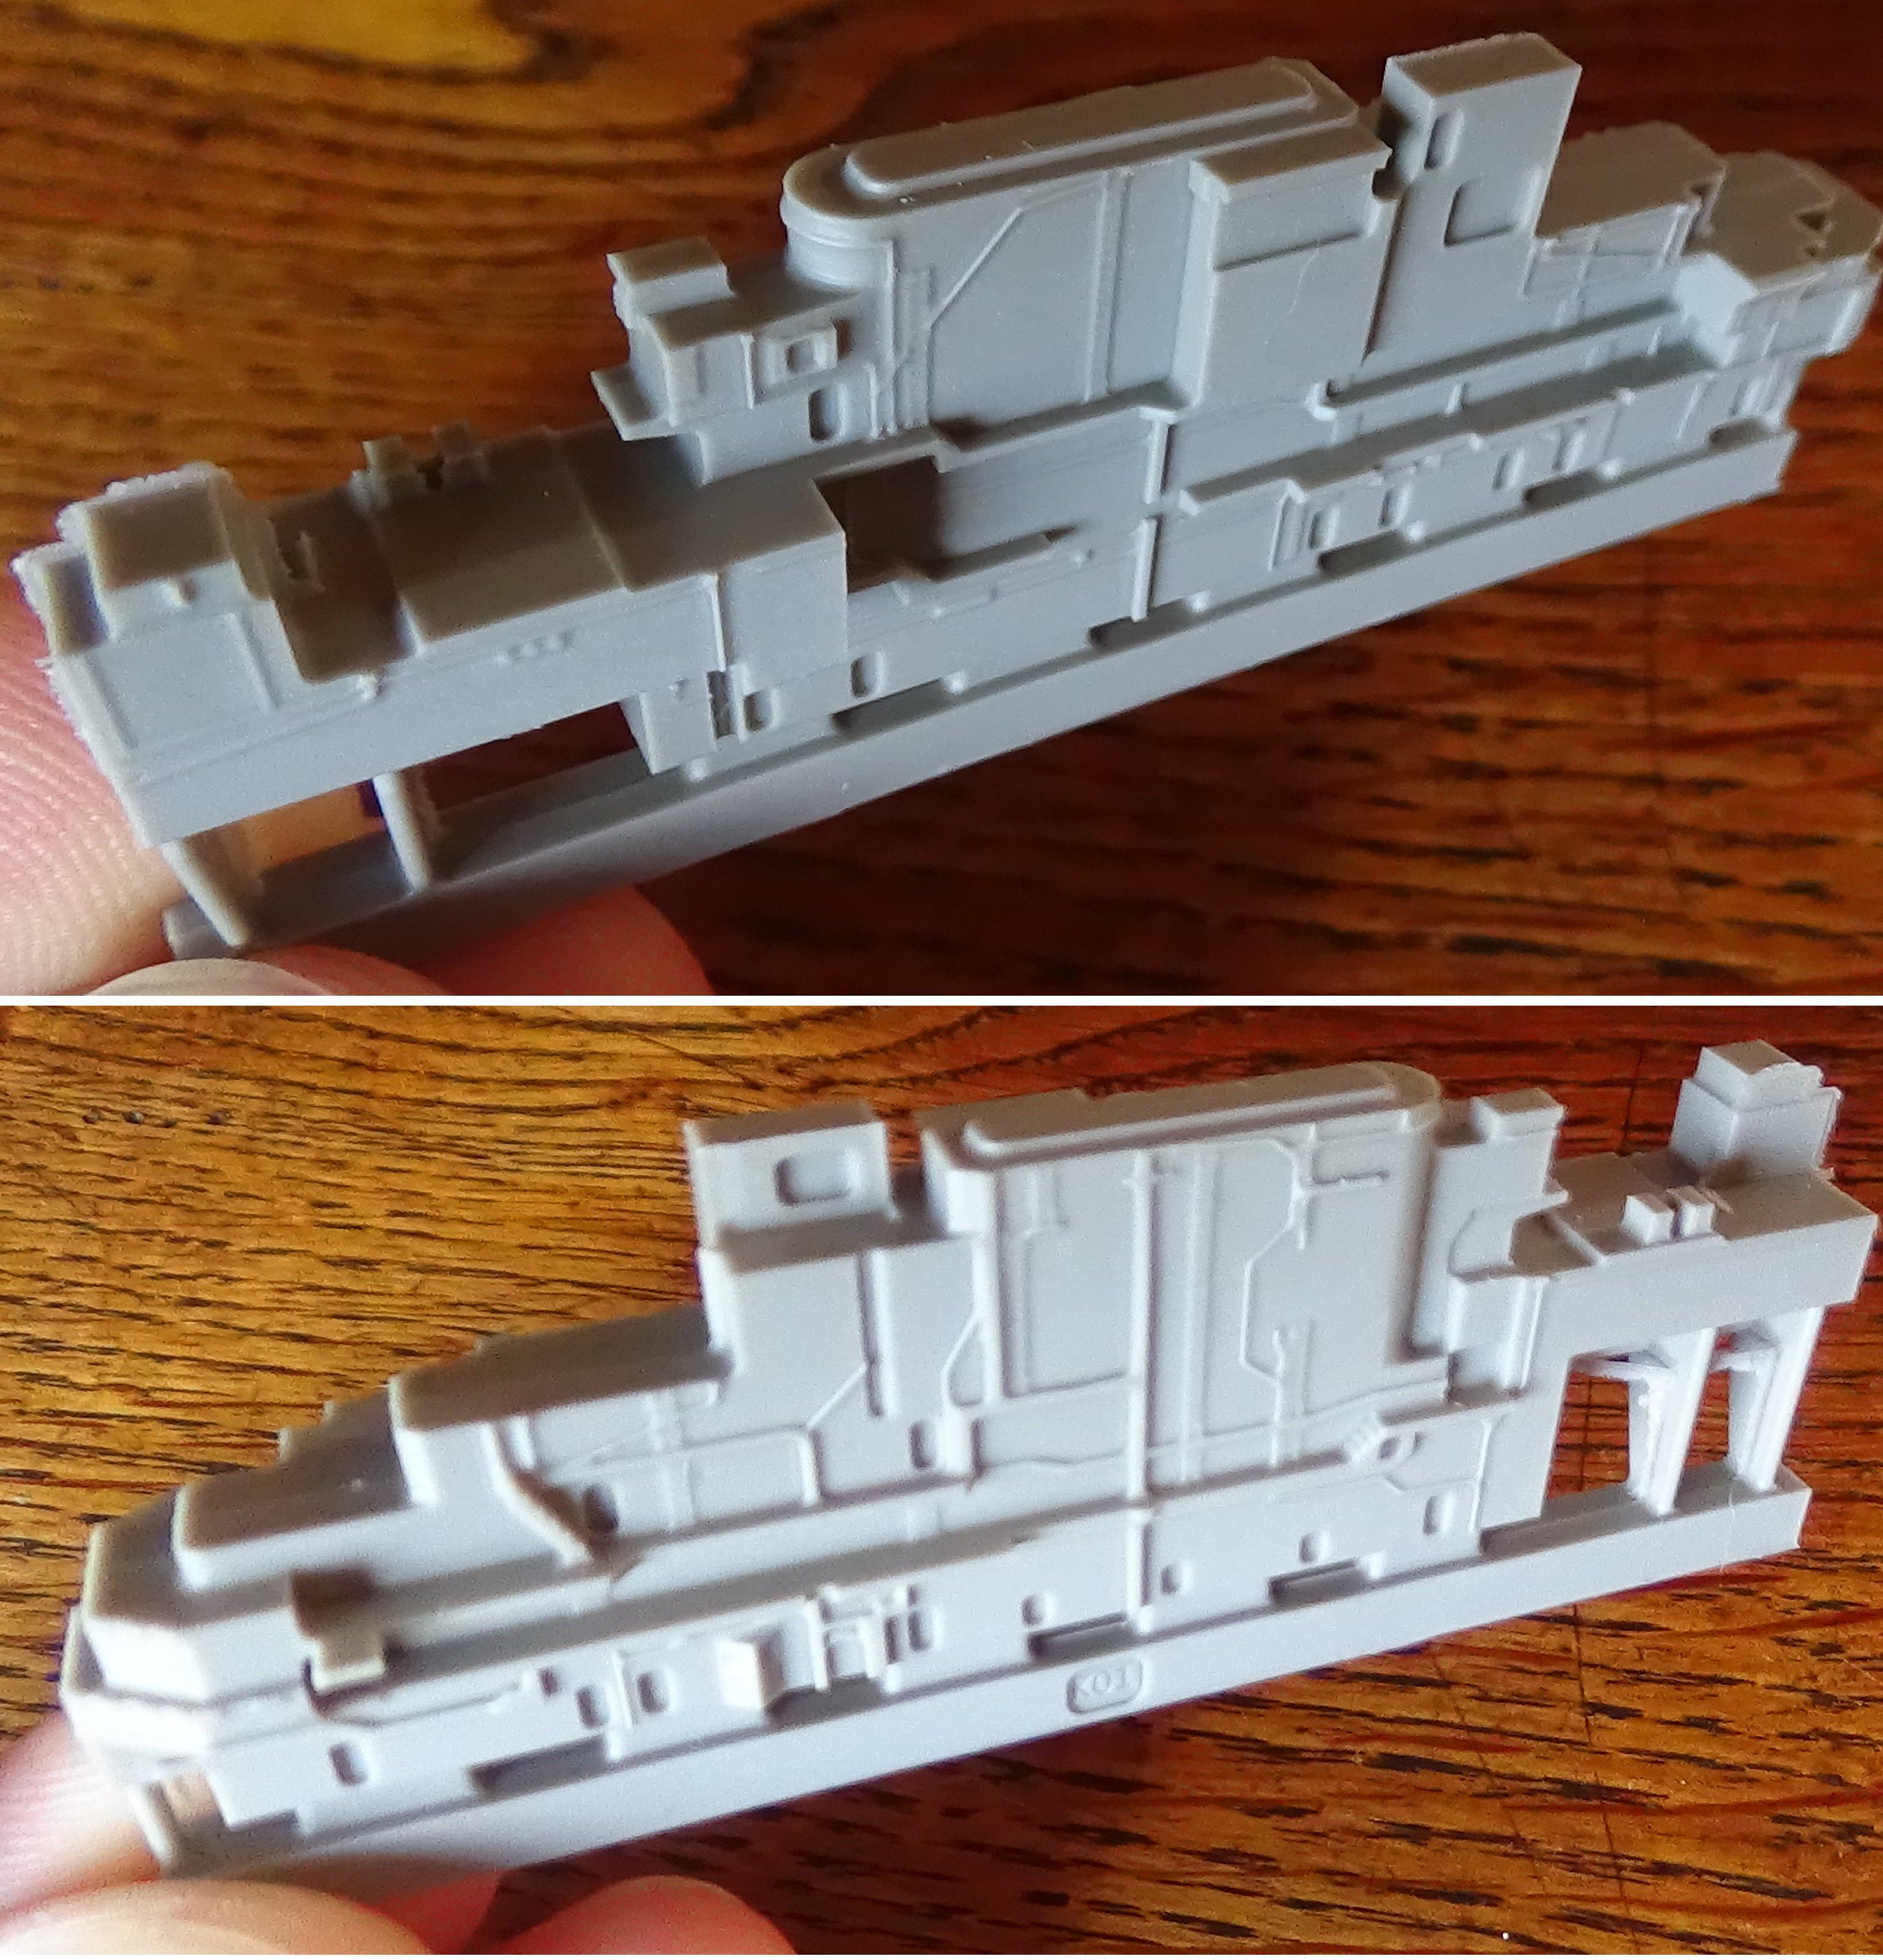 [USS Midway CVA-41] Porte avions lourd américain-700e-Orange Hobby 17071905023323134915155987